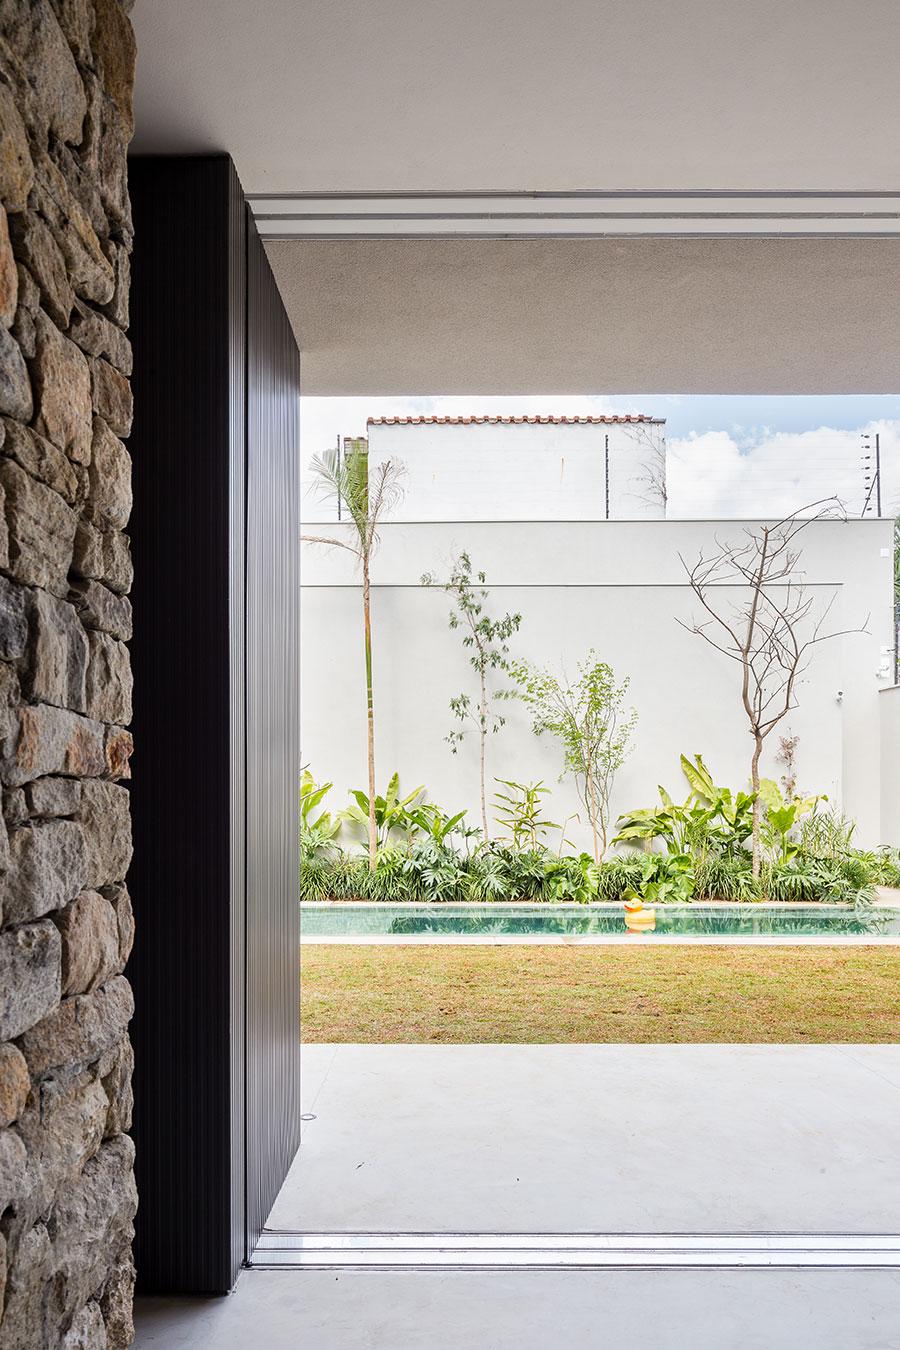 casa lara by felipe hess17 Lara House in Brasil by Felipe Hess